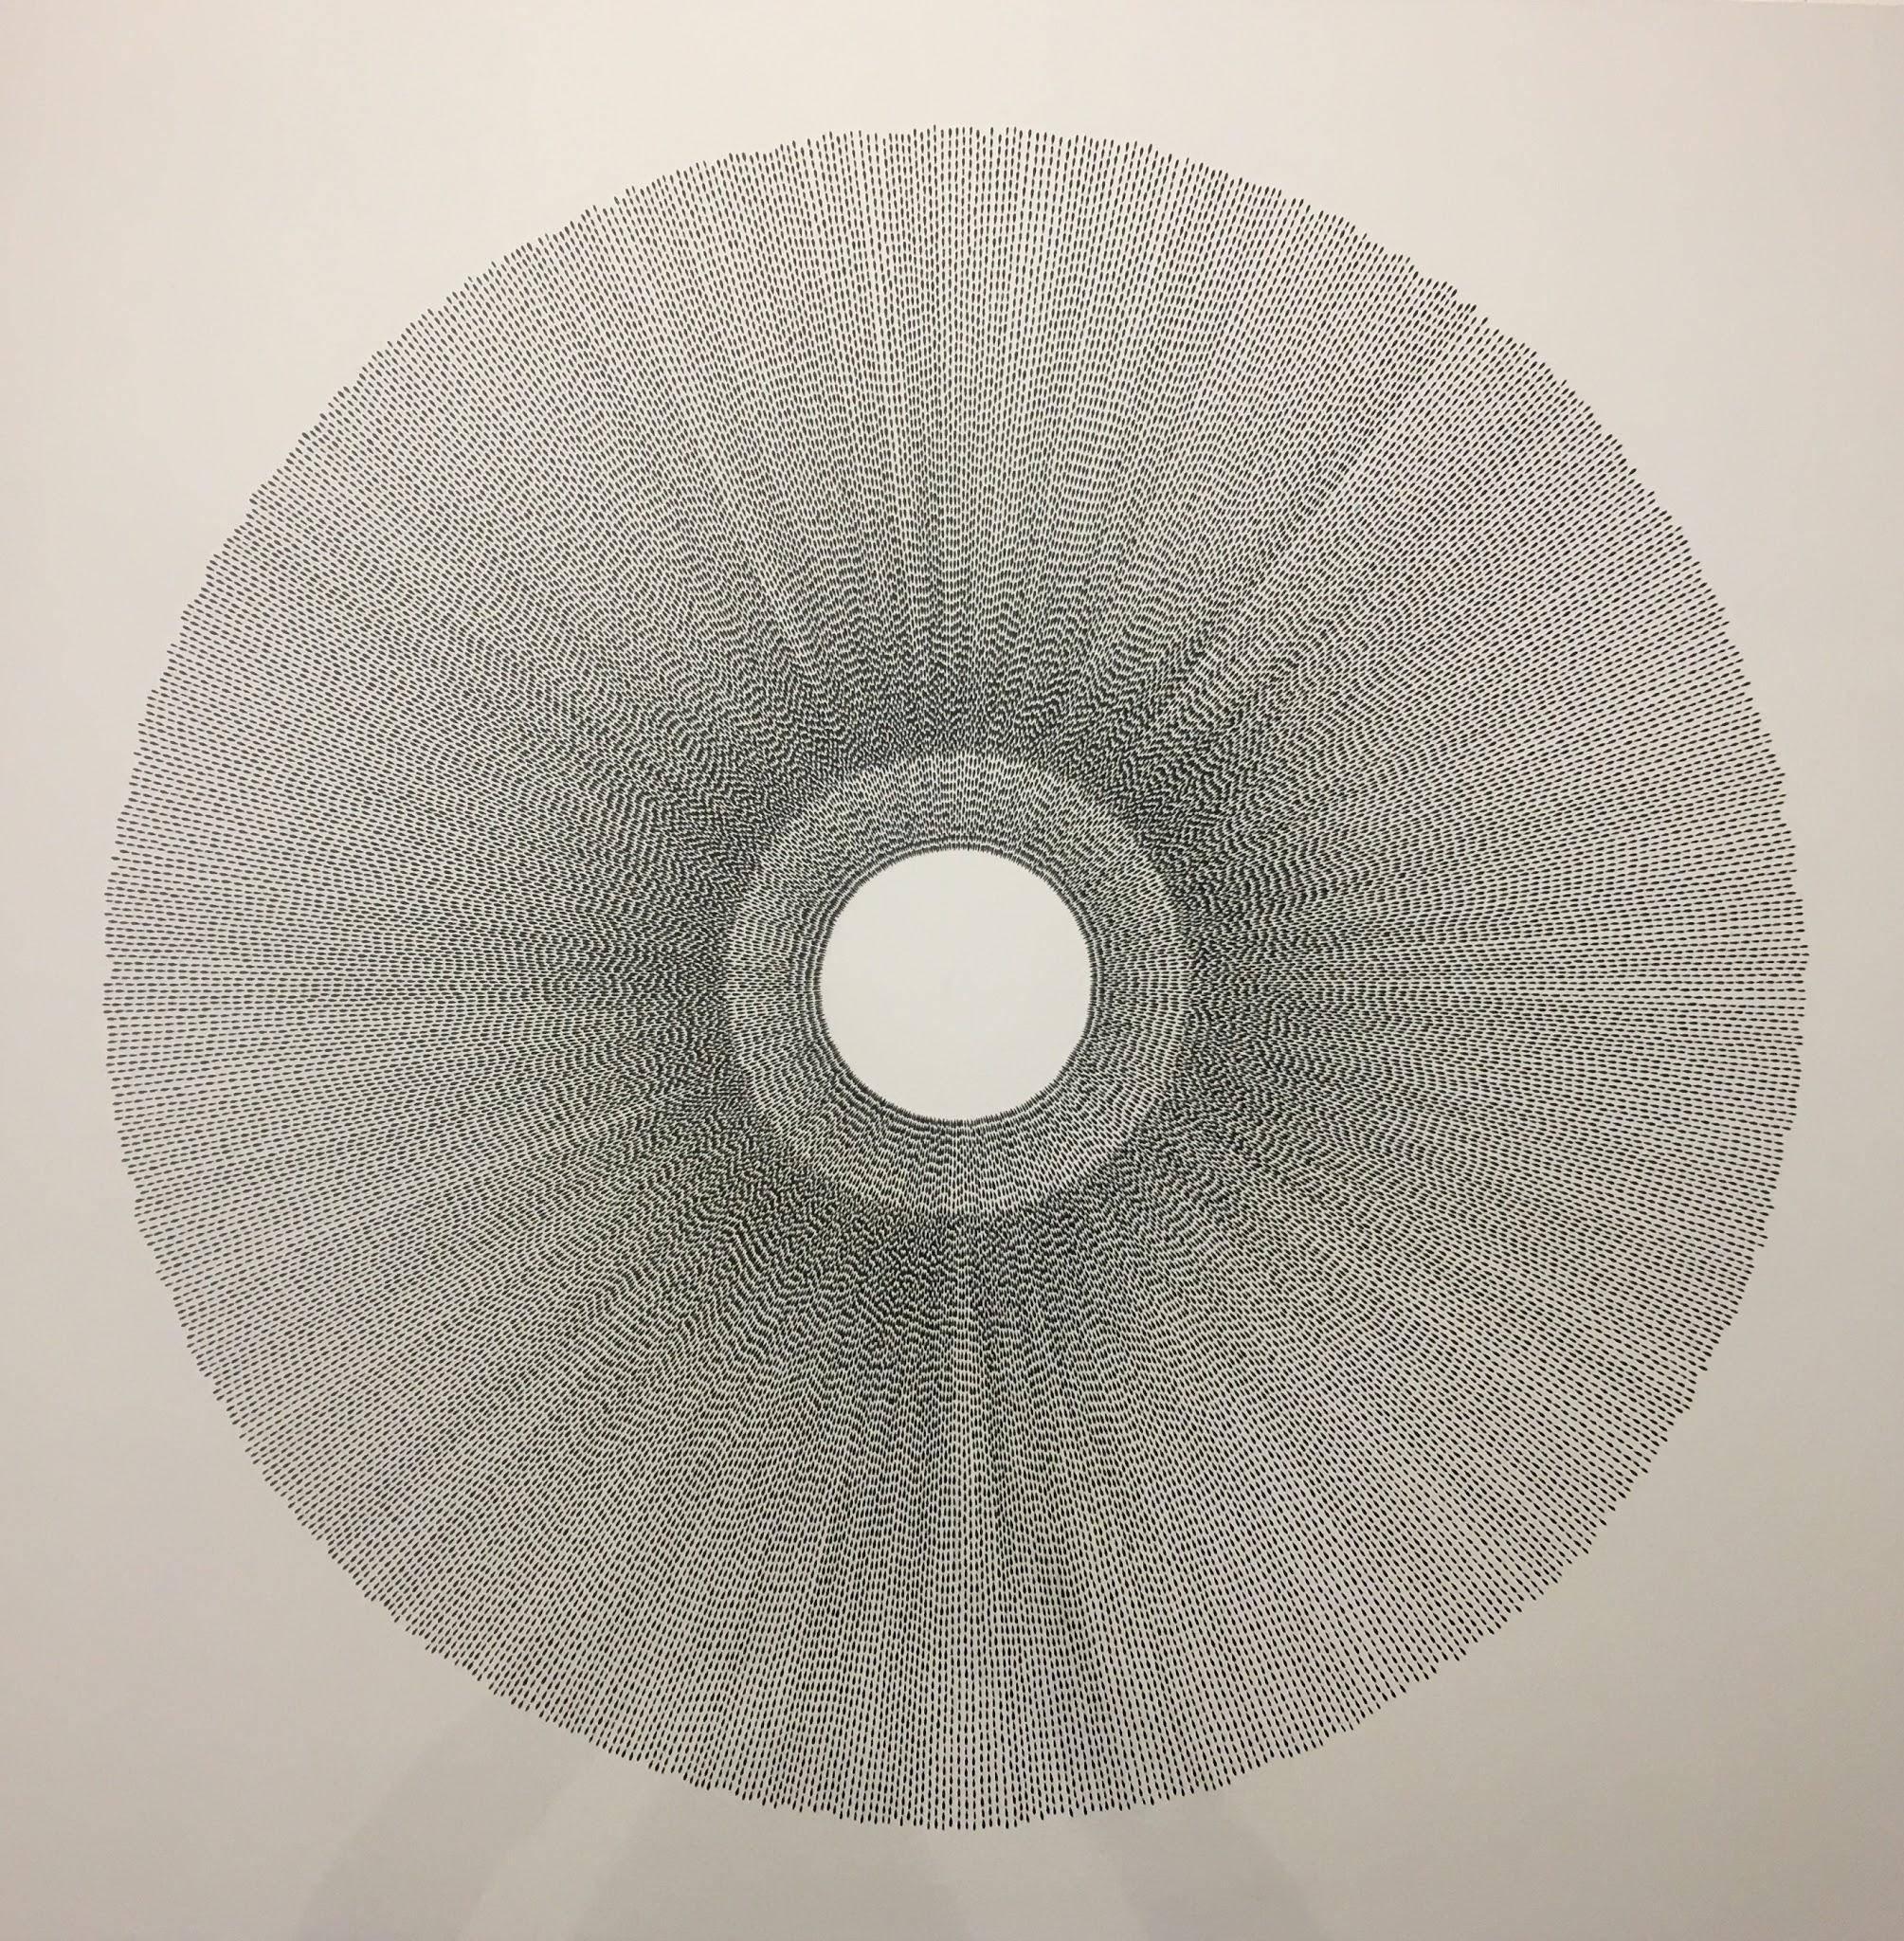 Rainsun III, Halsey Chait, Large Abstract Ink Drawing, Circle, Black, White